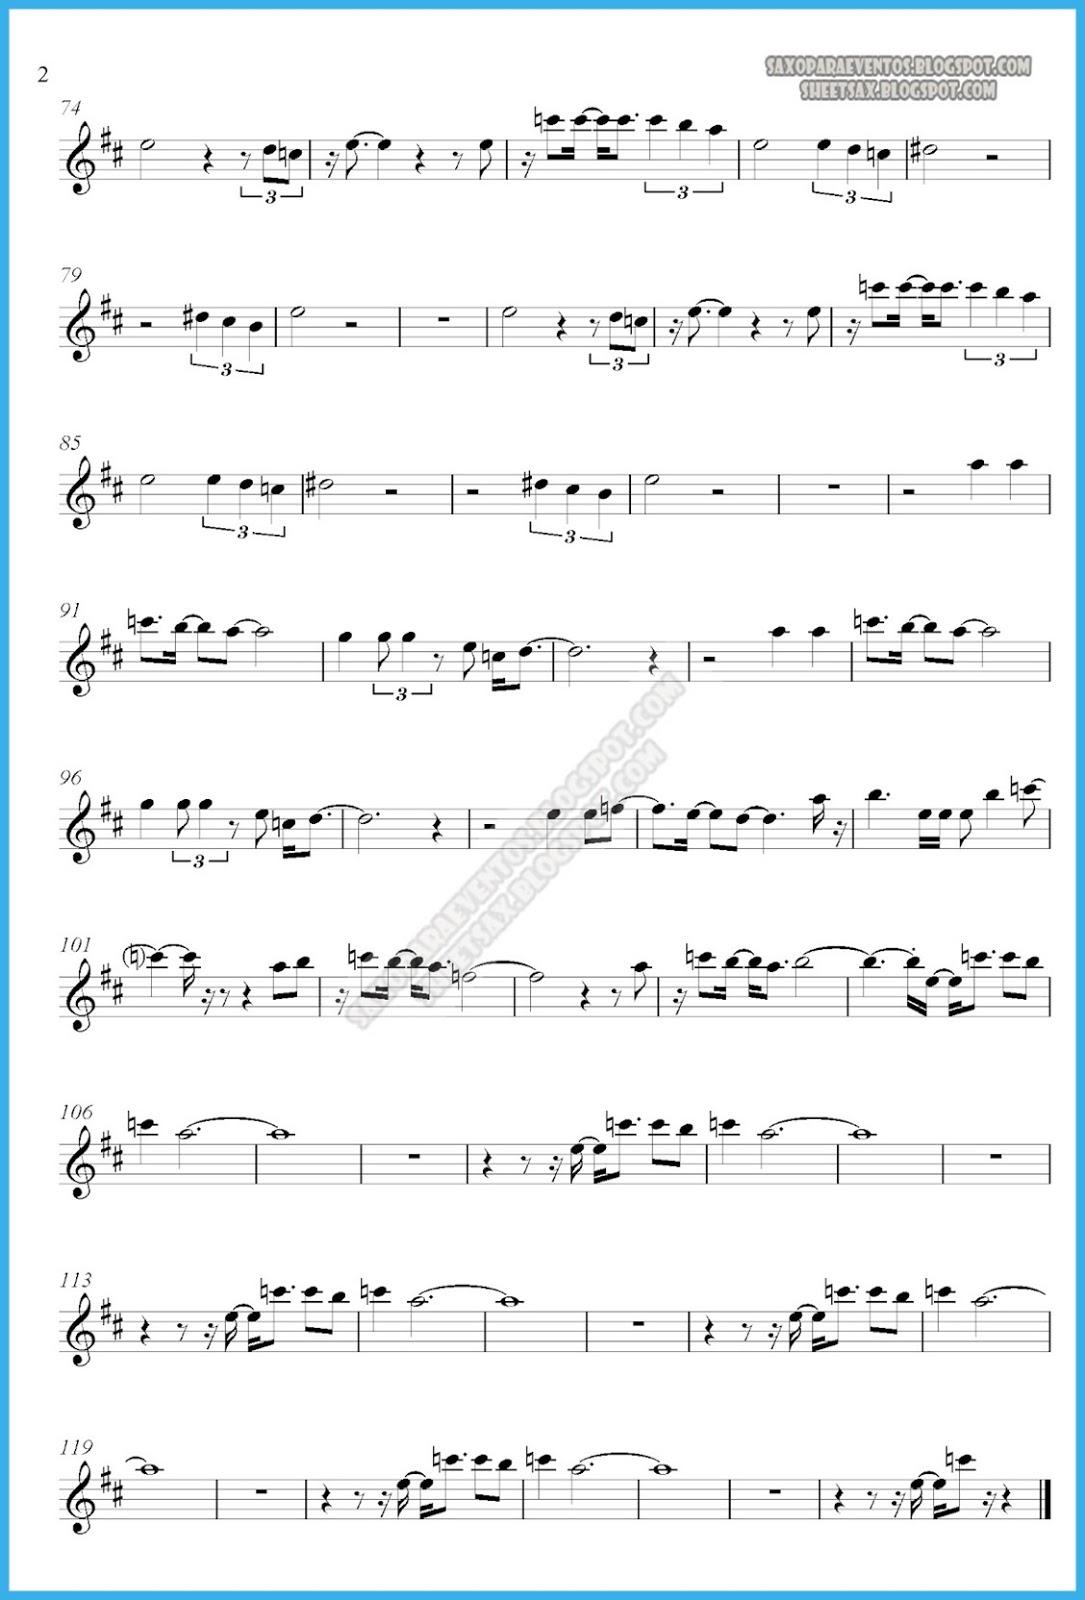 Music score of